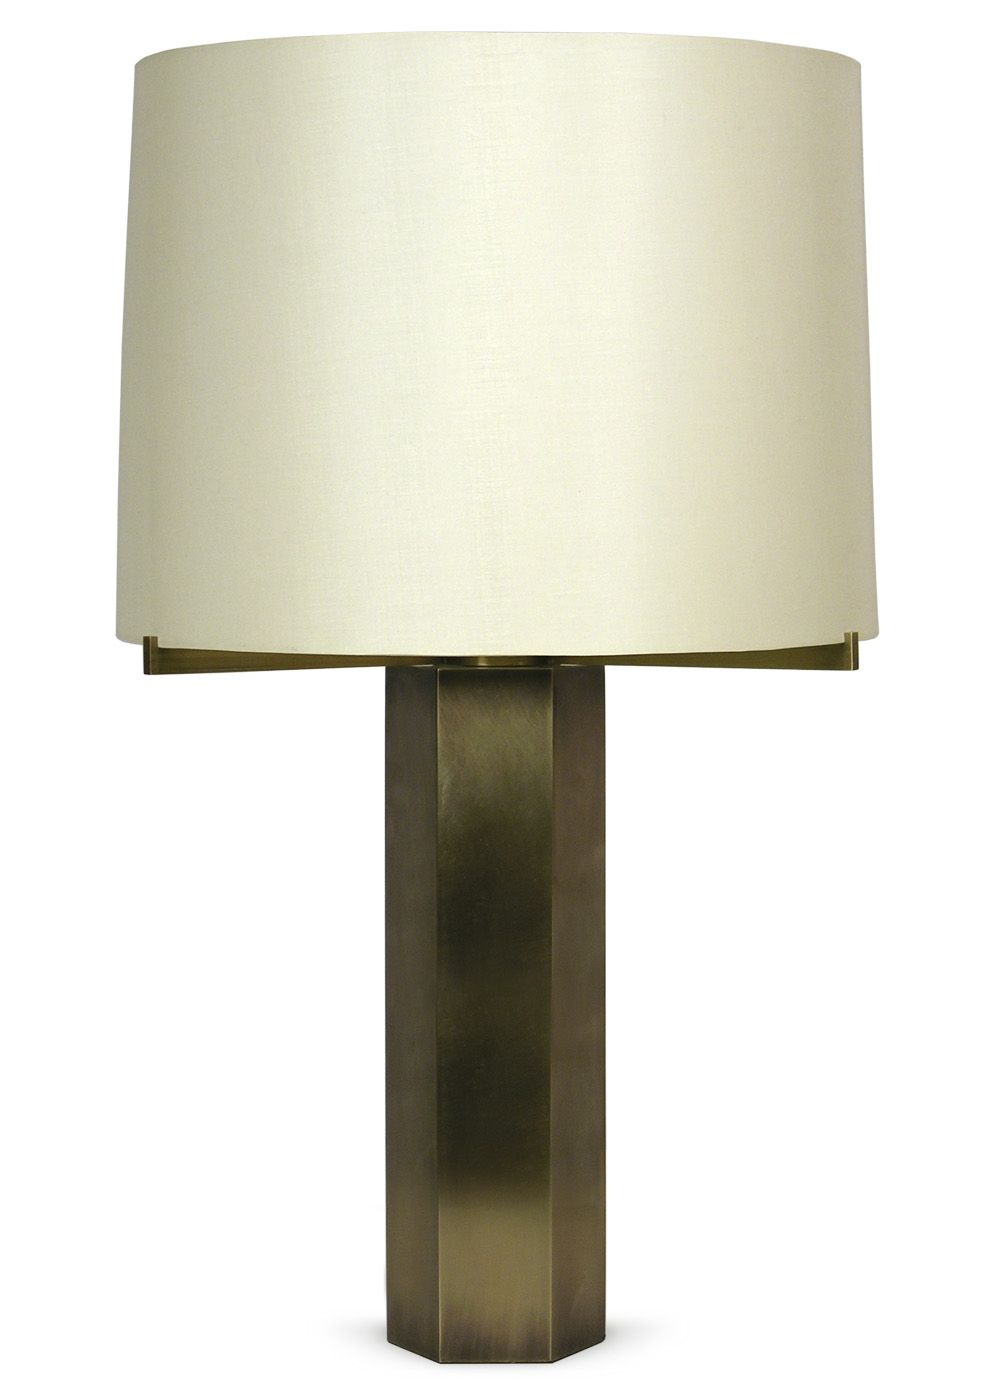 Dessin Fournir Companies | Table lamp